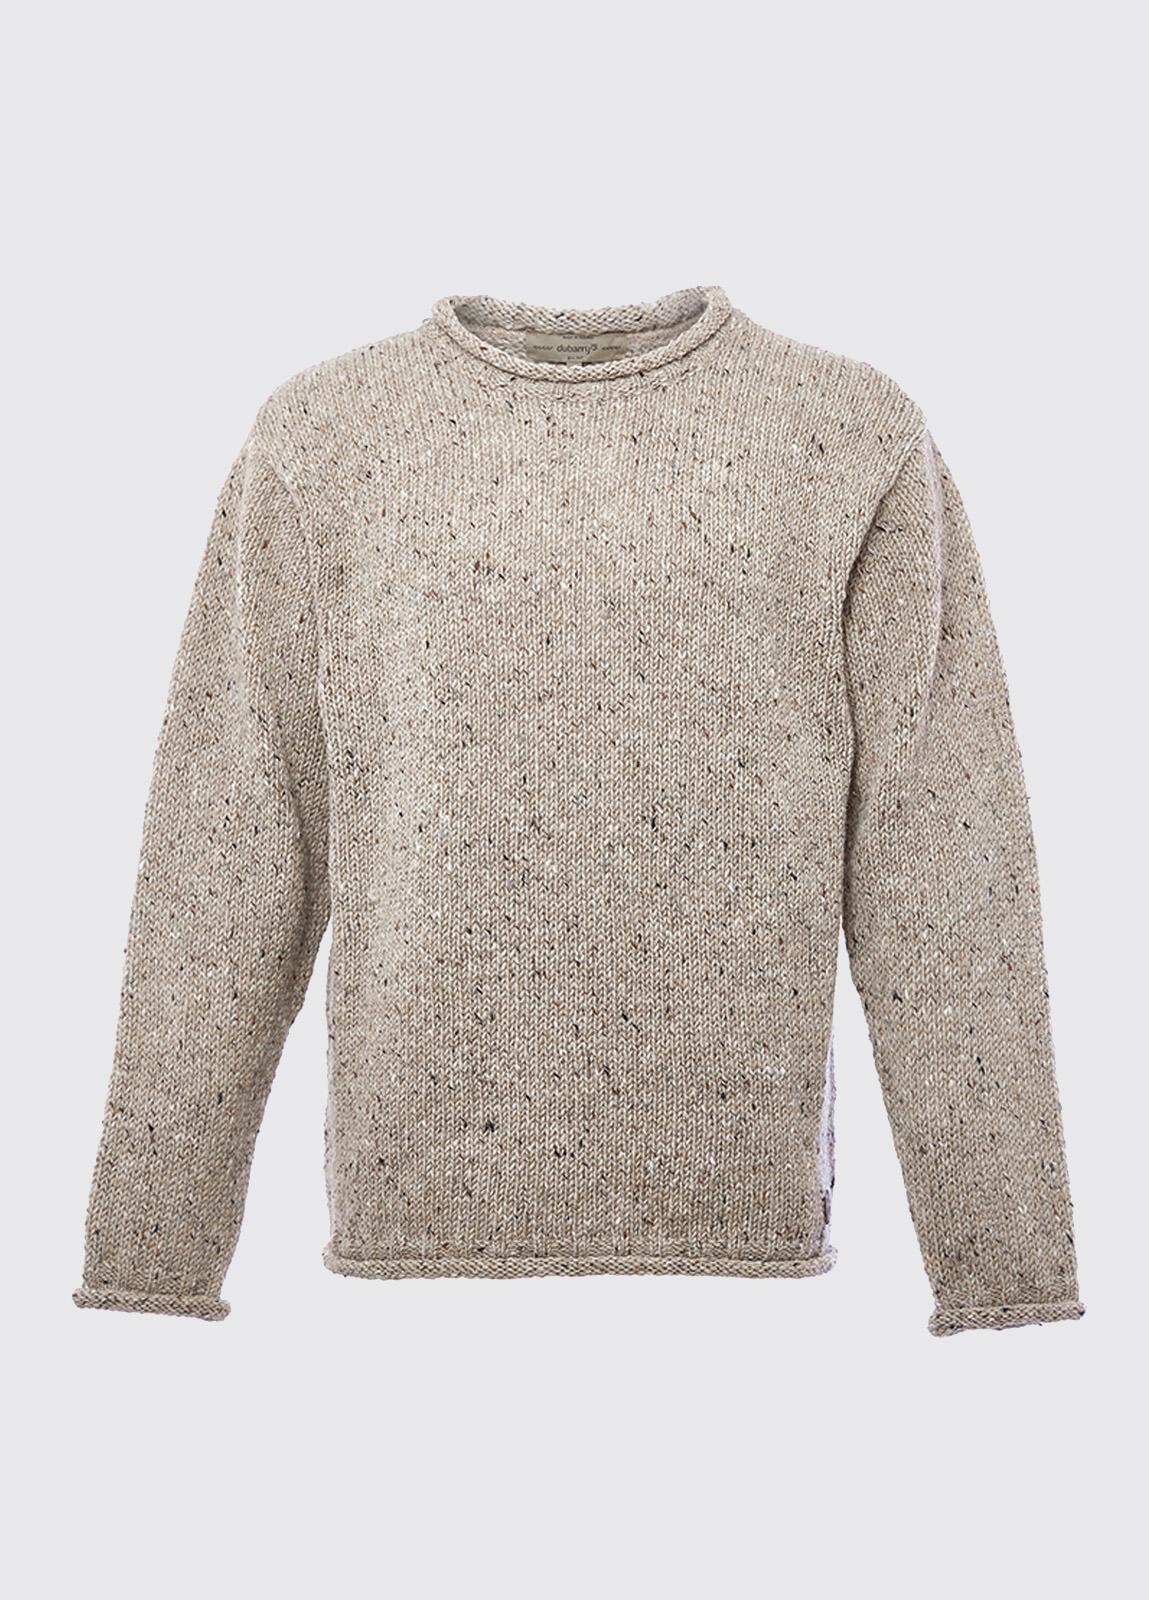 Marshall Crew Neck Sweater - Oatmeal